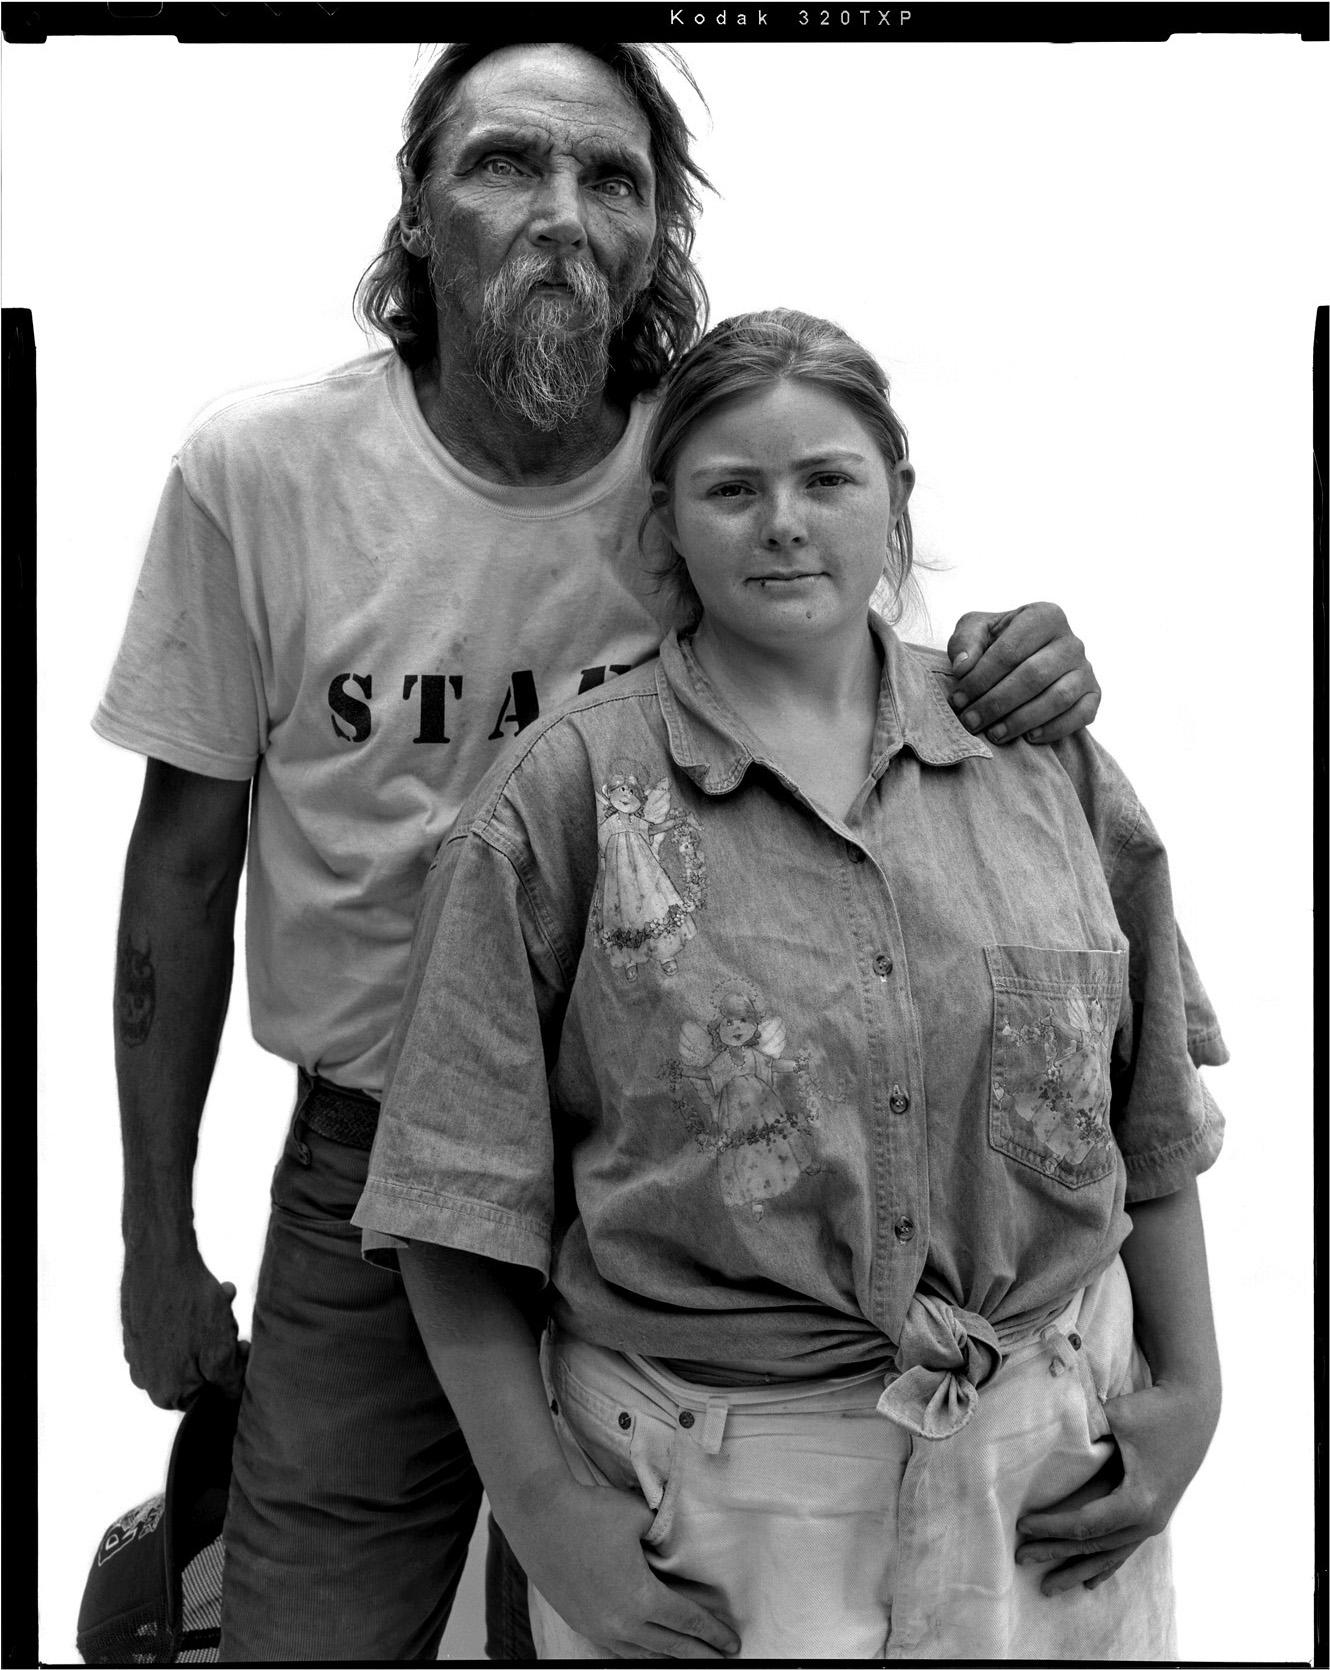 Wayne and Linda Smith, Slab City, for Neue Zürcher Zeitung, 2004